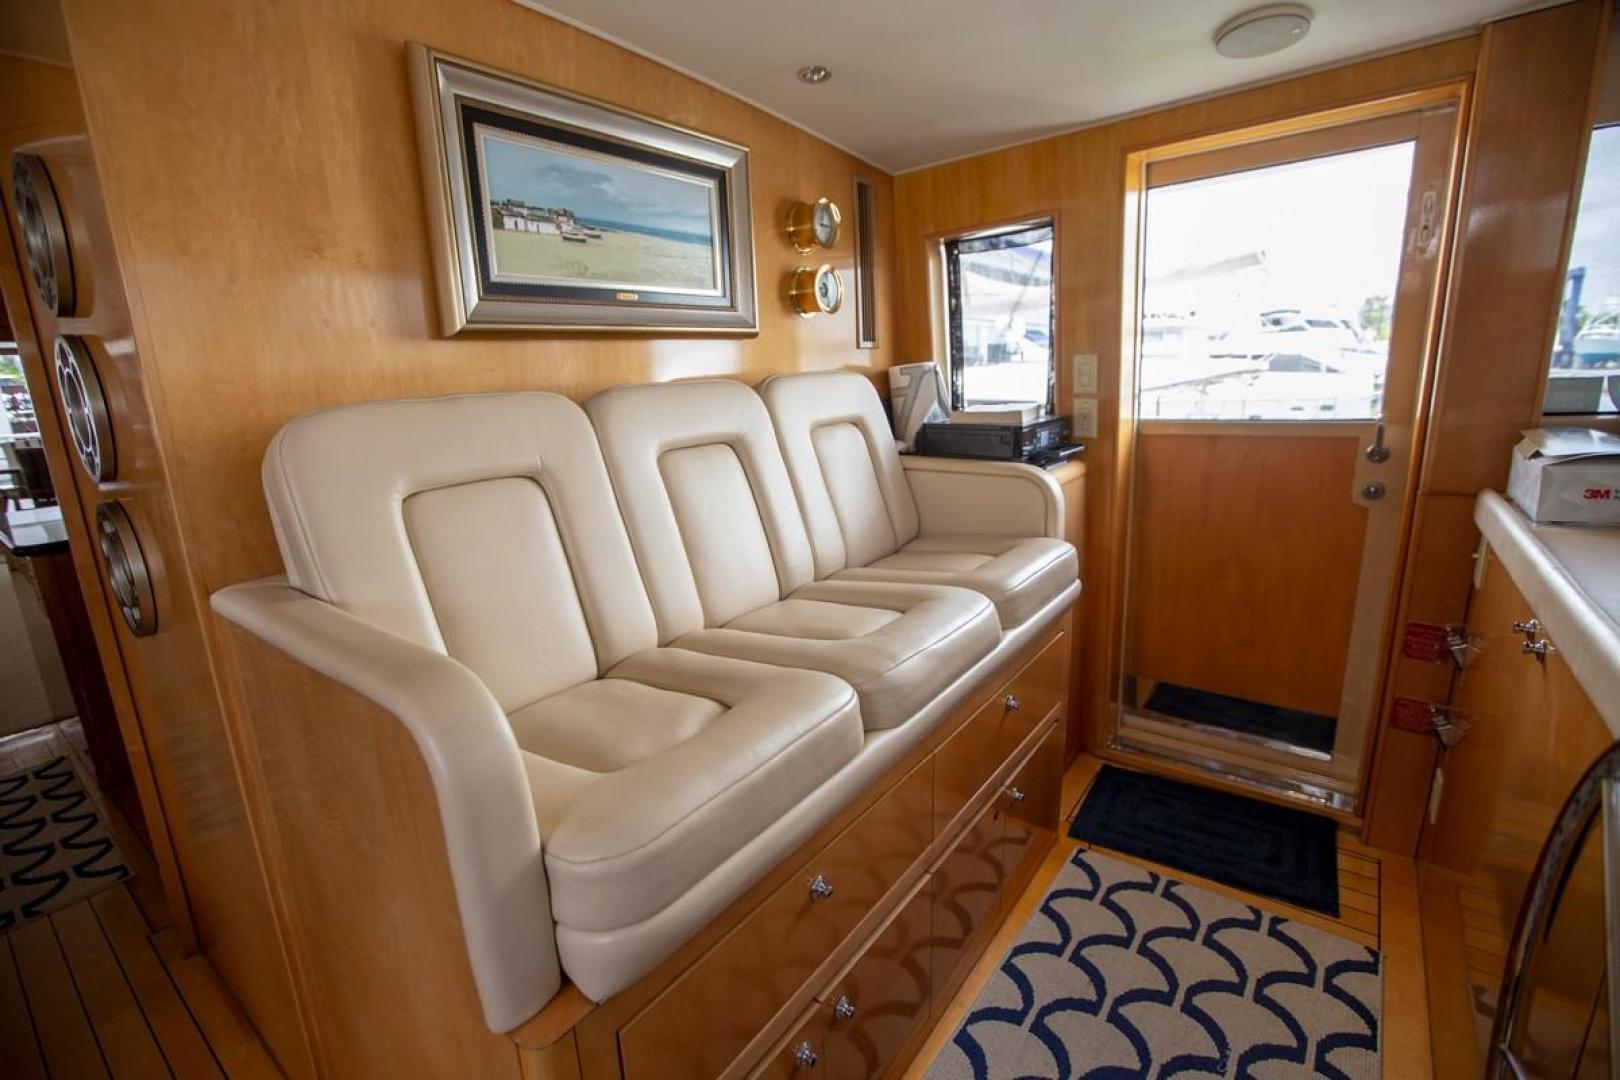 Hatteras-Cockpit Motor Yacht 2000-Getaway Ft. Lauderdale-Florida-United States-977376 | Thumbnail